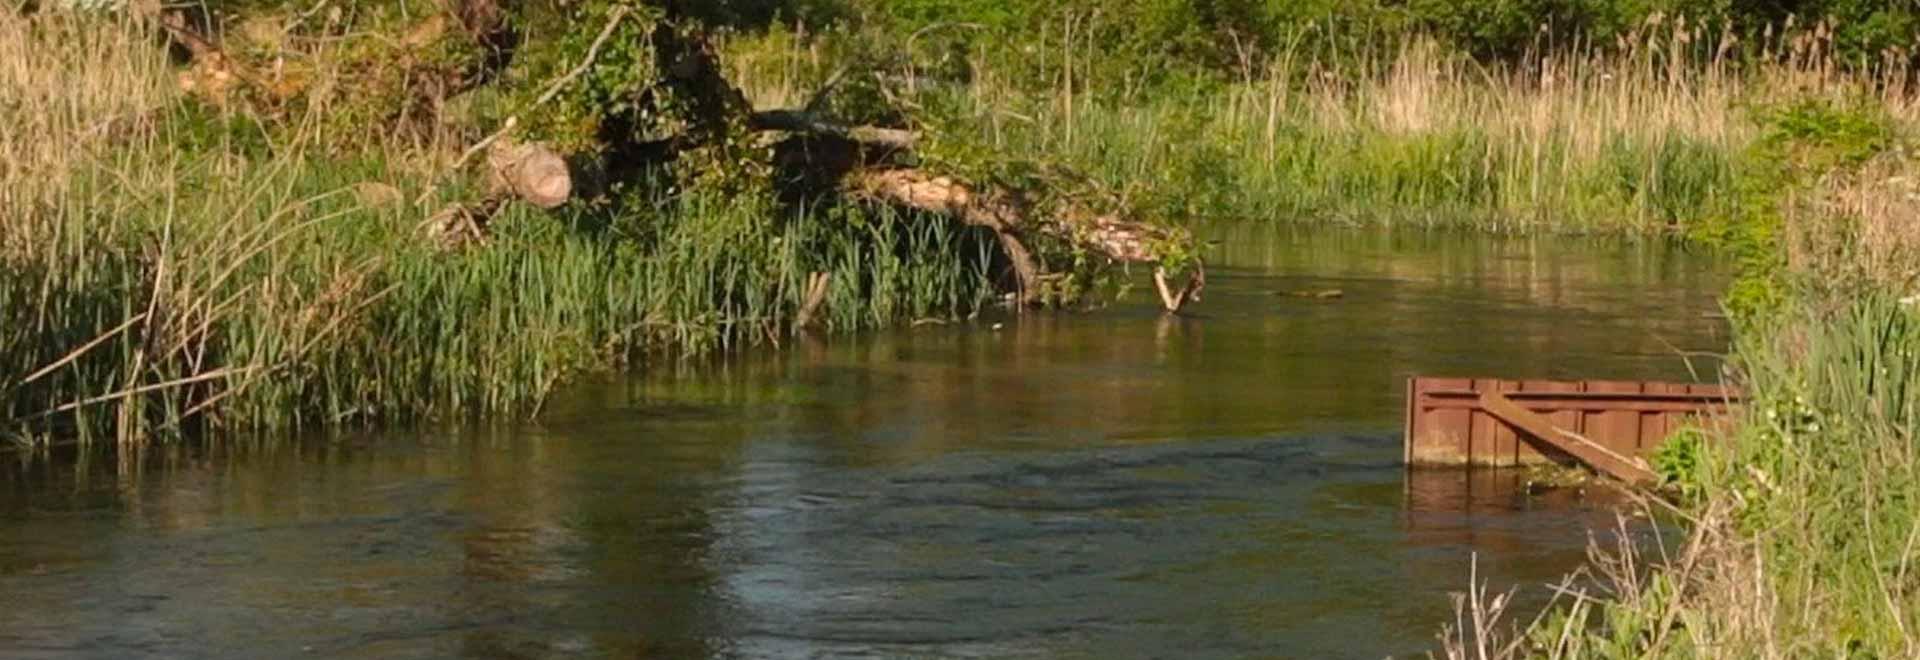 Il fiume Test. 2a parte